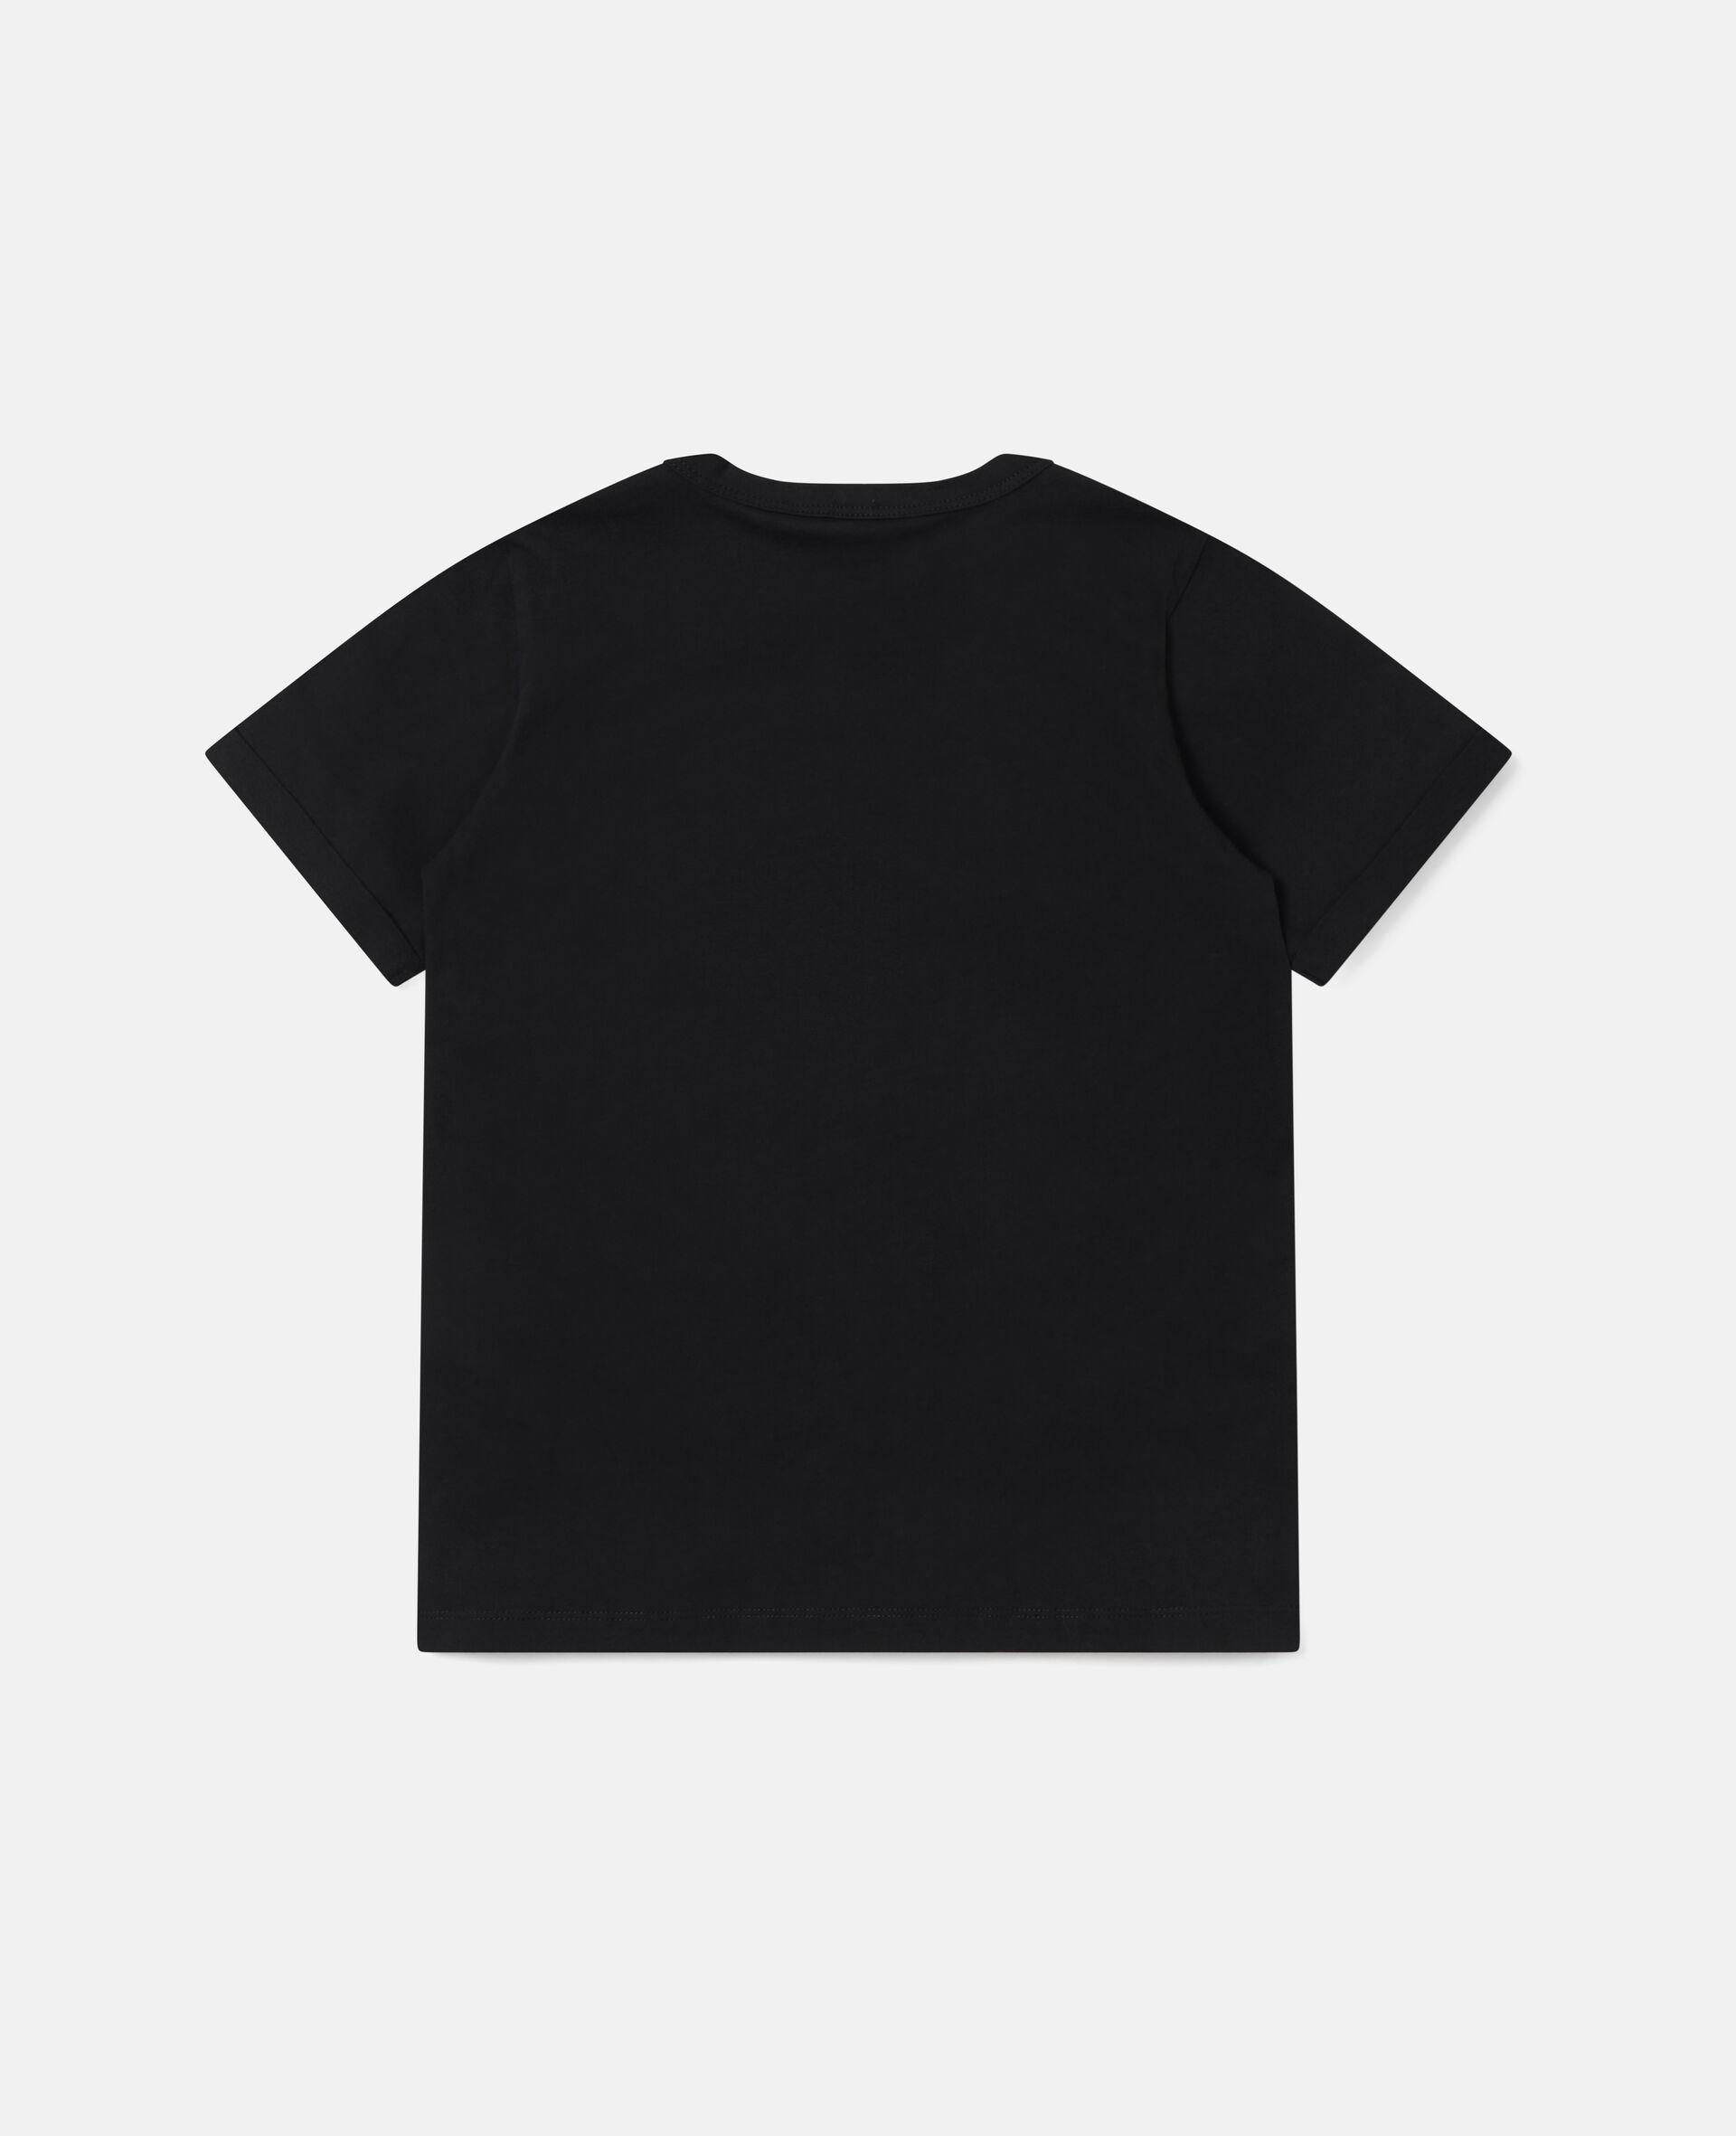 Spotty Flower Cotton T-shirt -Black-large image number 3